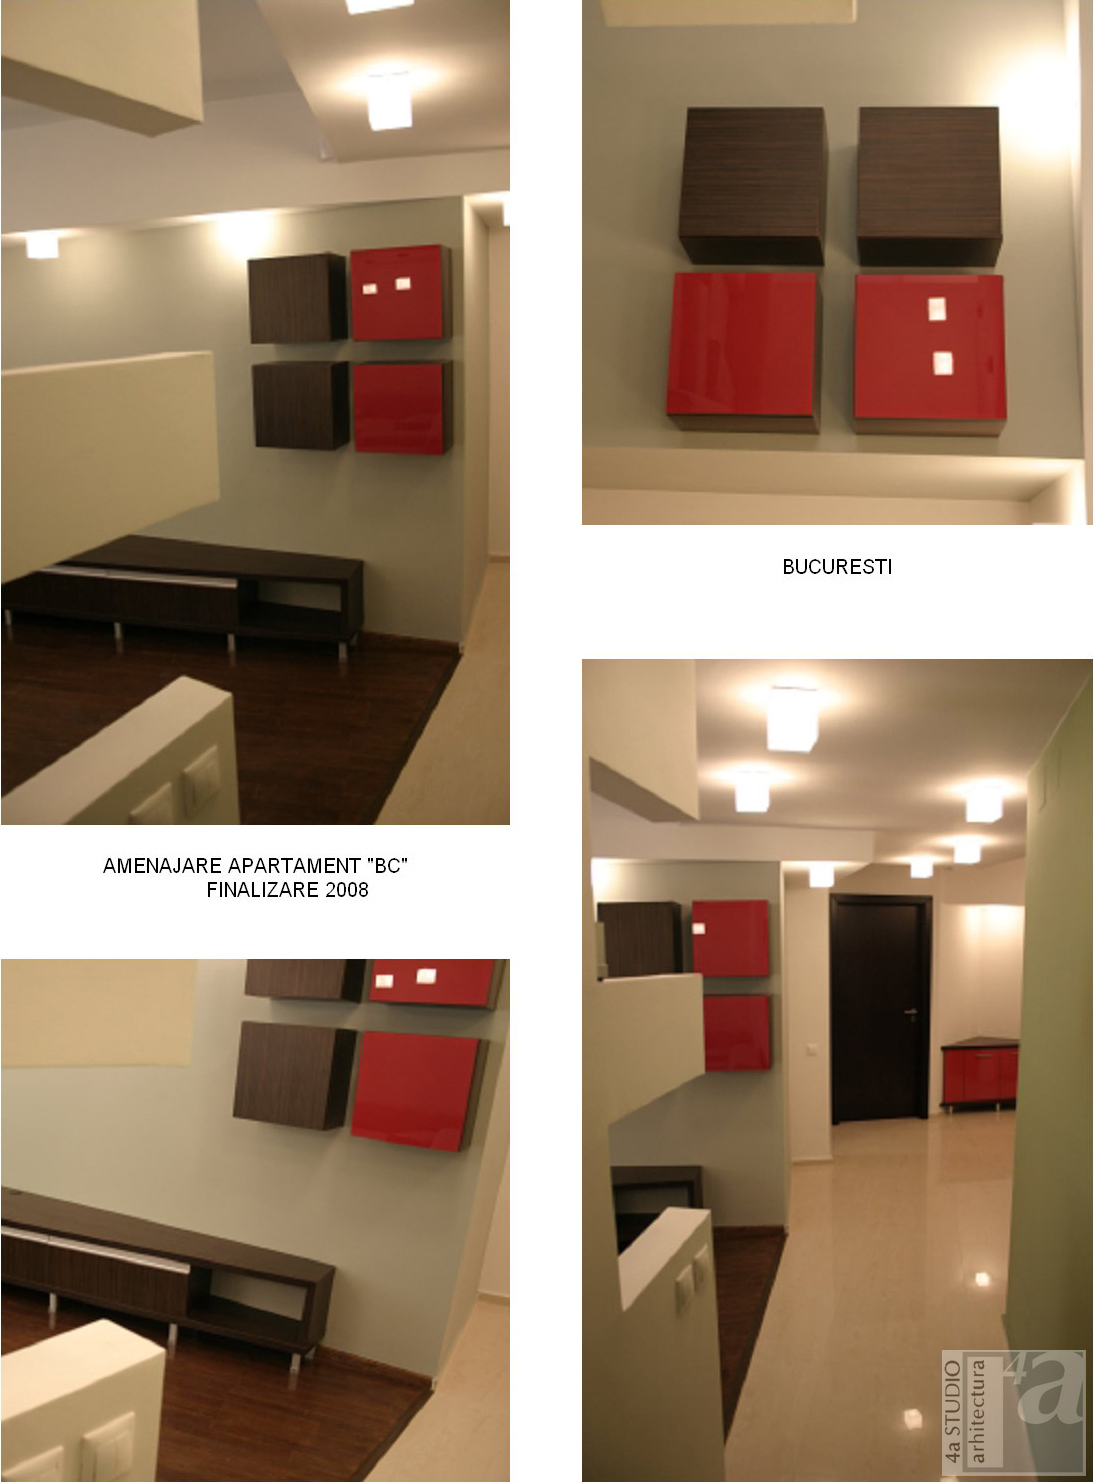 Amenajare apartament C - Bucuresti  - Poza 1